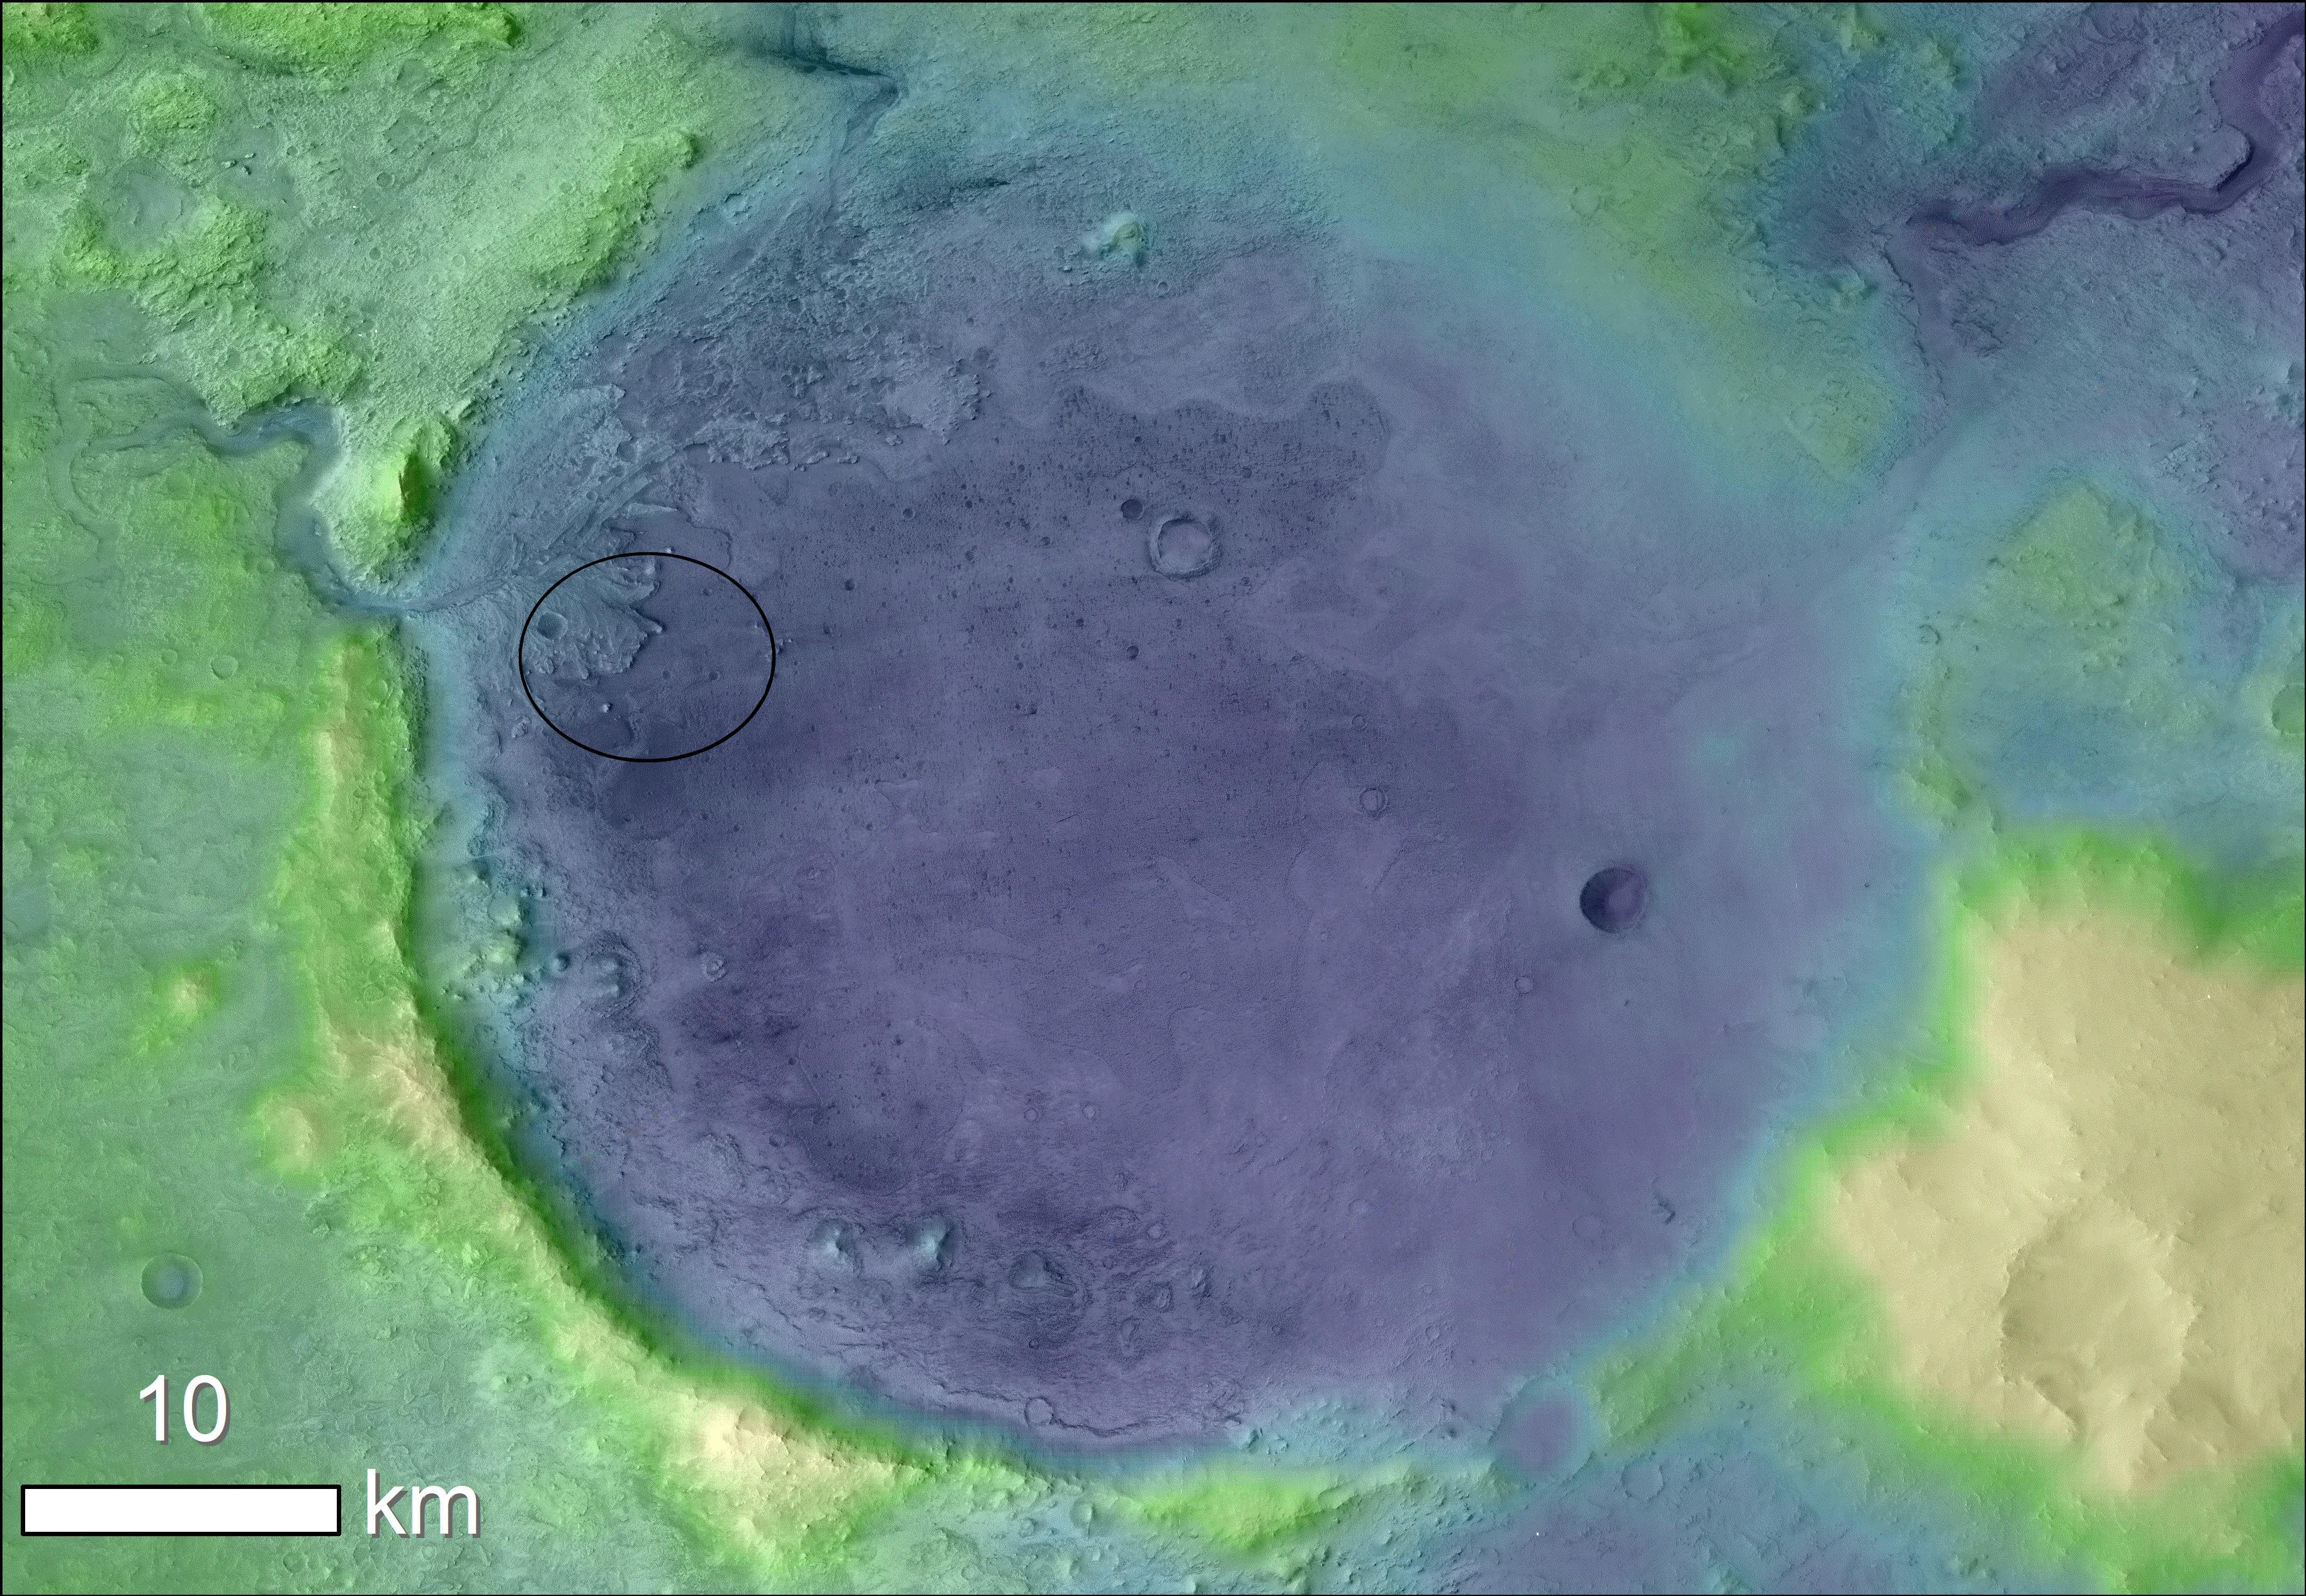 nasa-jezero-crater-landing-site